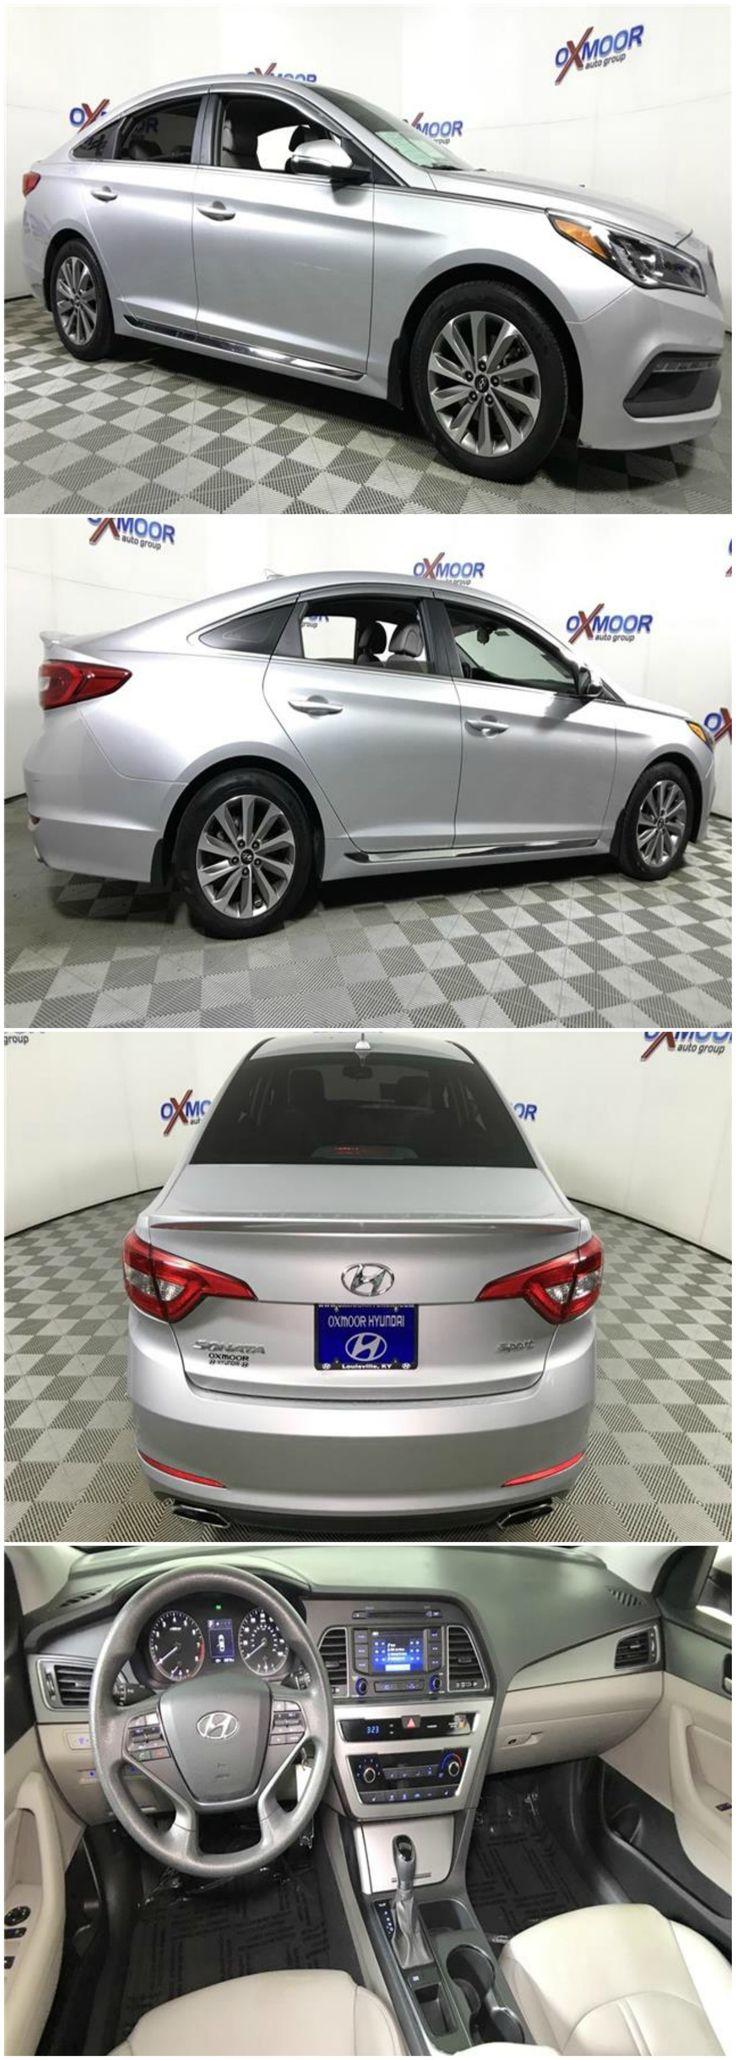 2015 Hyundai Sonata Limited - $16,000